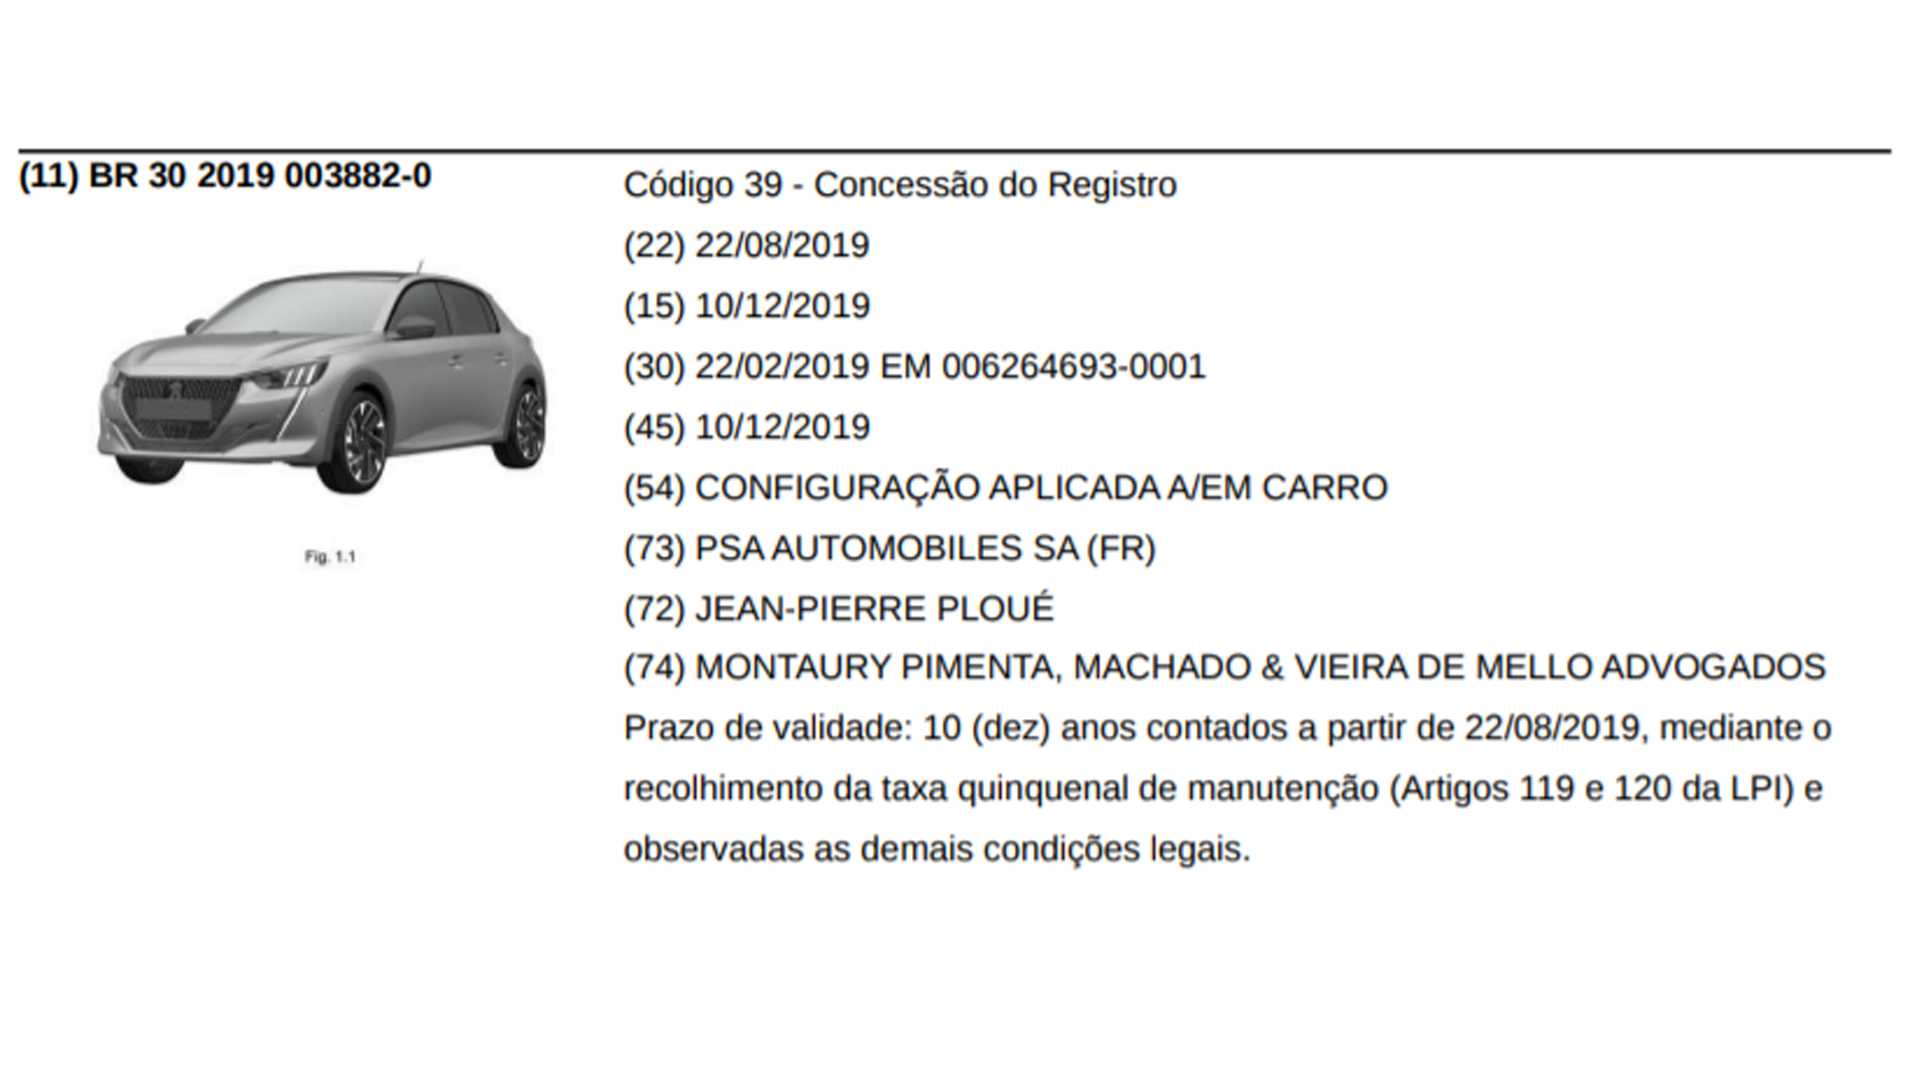 Nuevo Peugeot 208 versión full